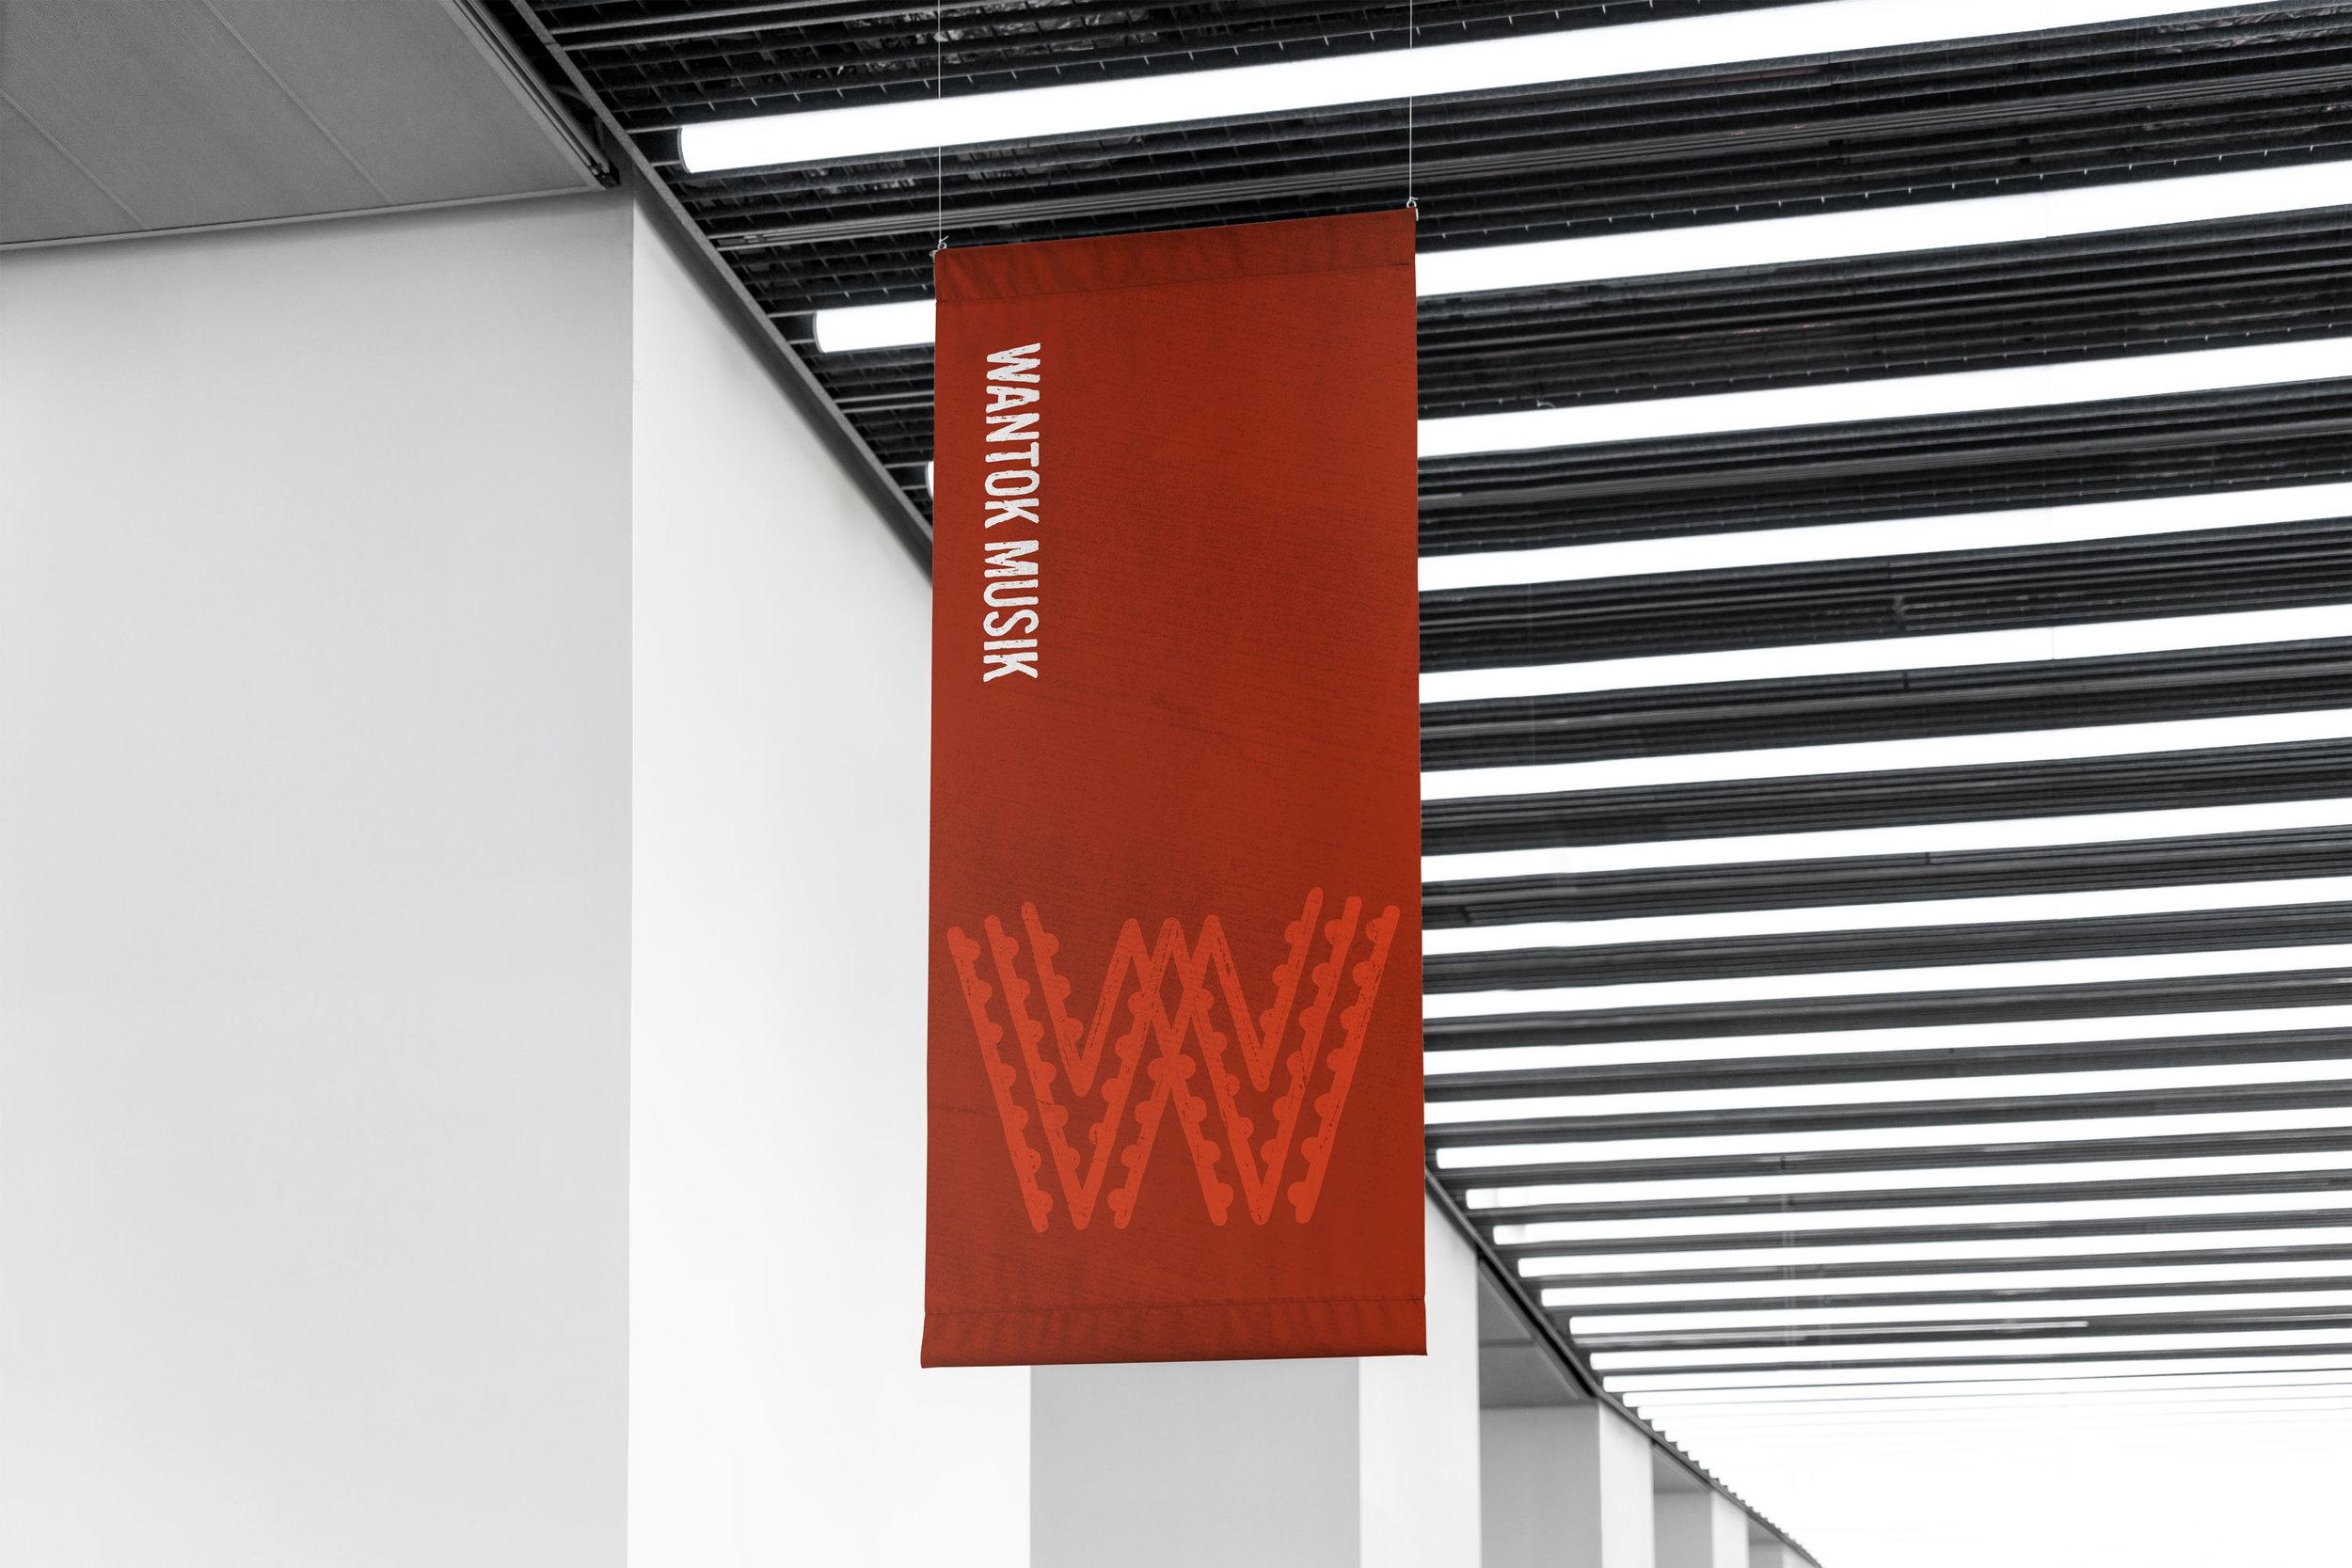 Wantok Musik - Branding, Collateral